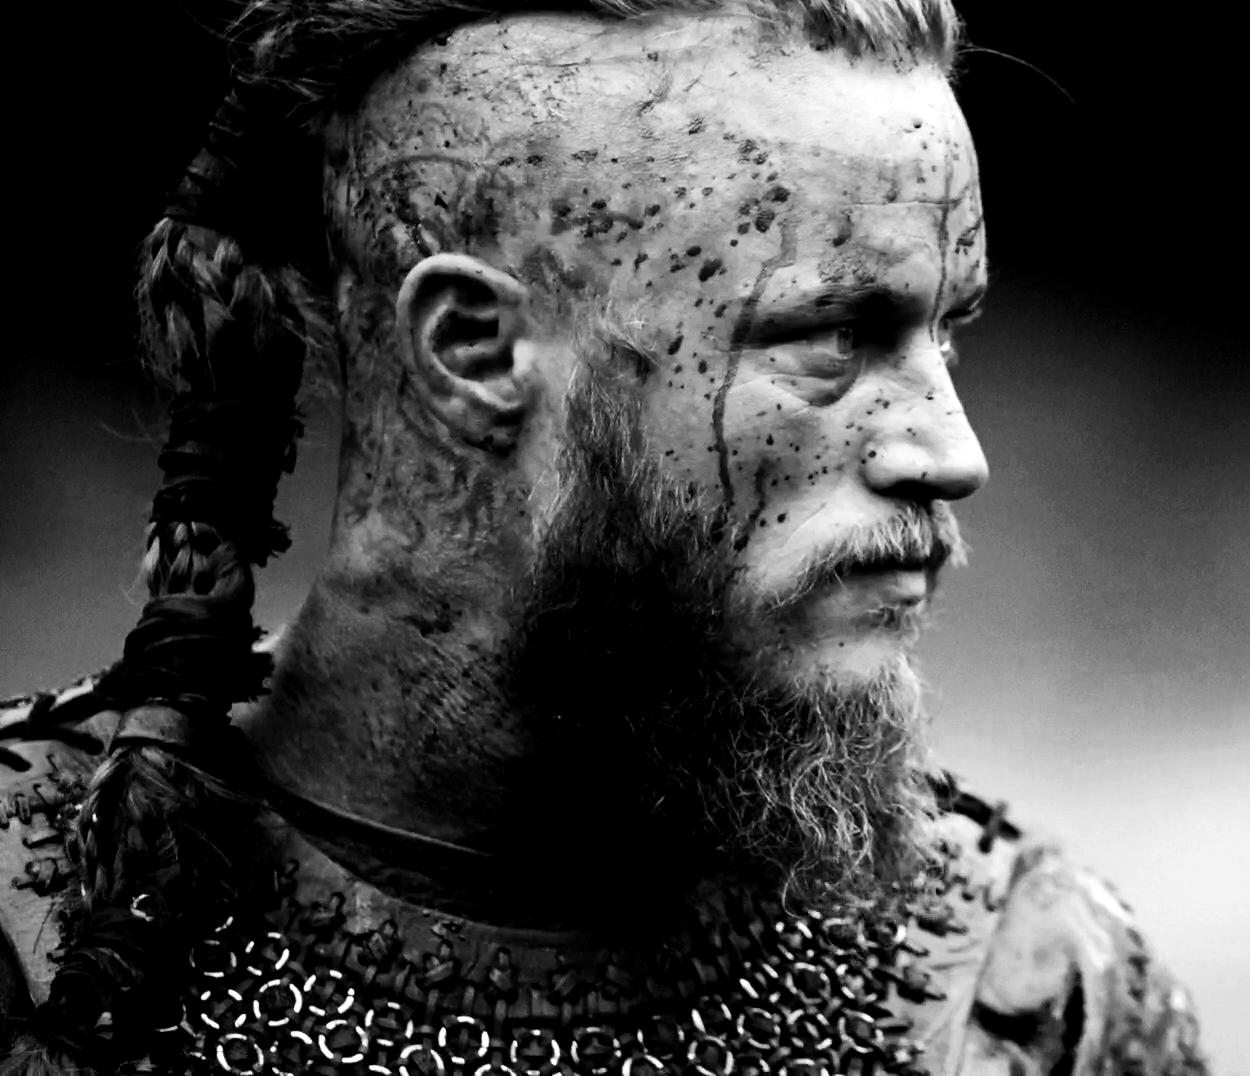 Travis Fimmel - Ragnar - Vikings | Travis Fimmel ...